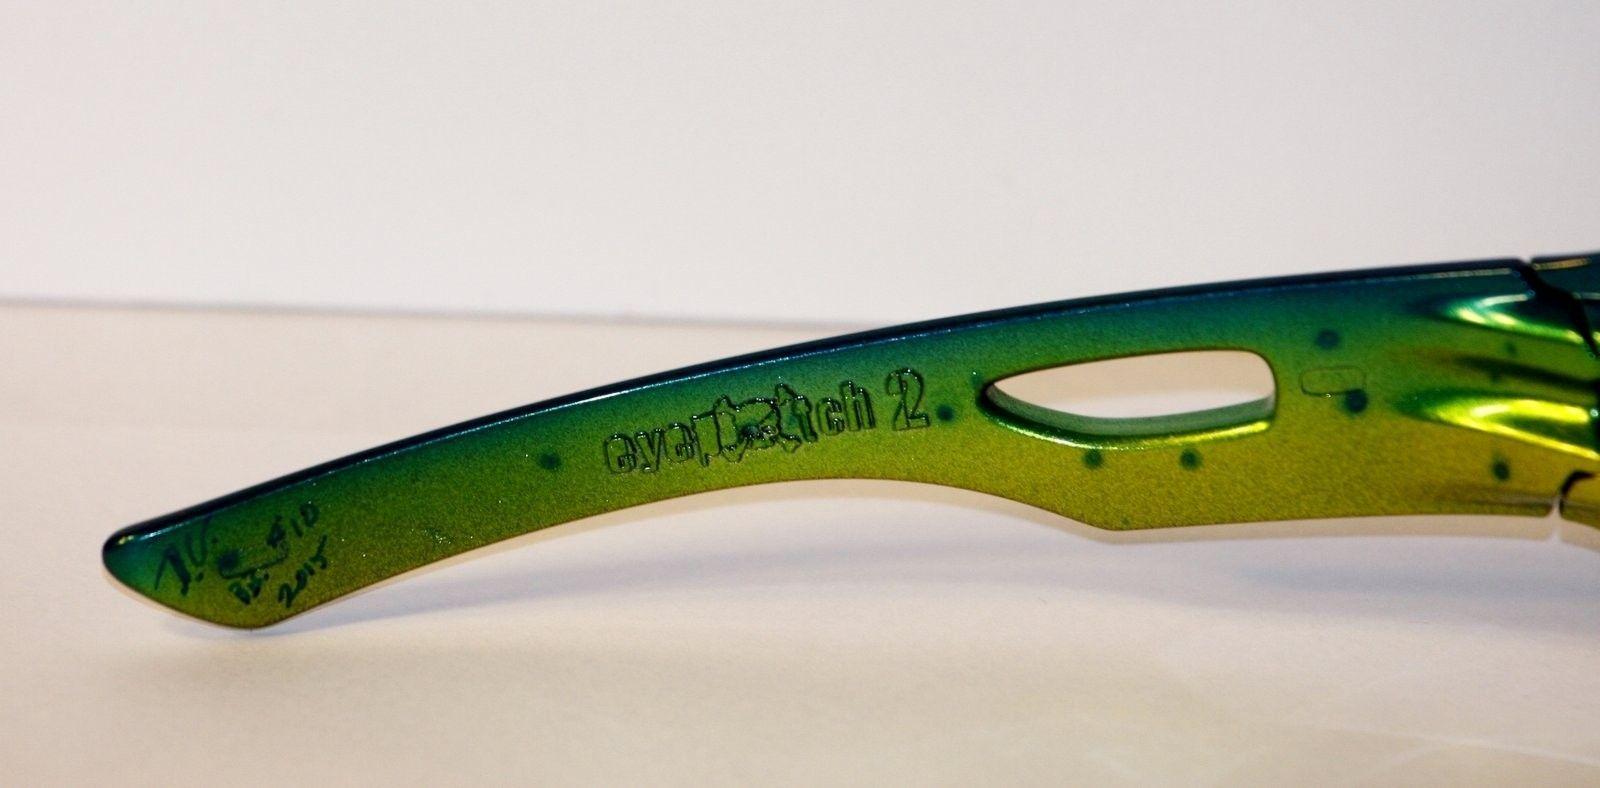 Dr. Chop Custom EyePatch 2 Price Drop - Ferrari Carbon Blade, Robot, DR chop bagger 019.JPG